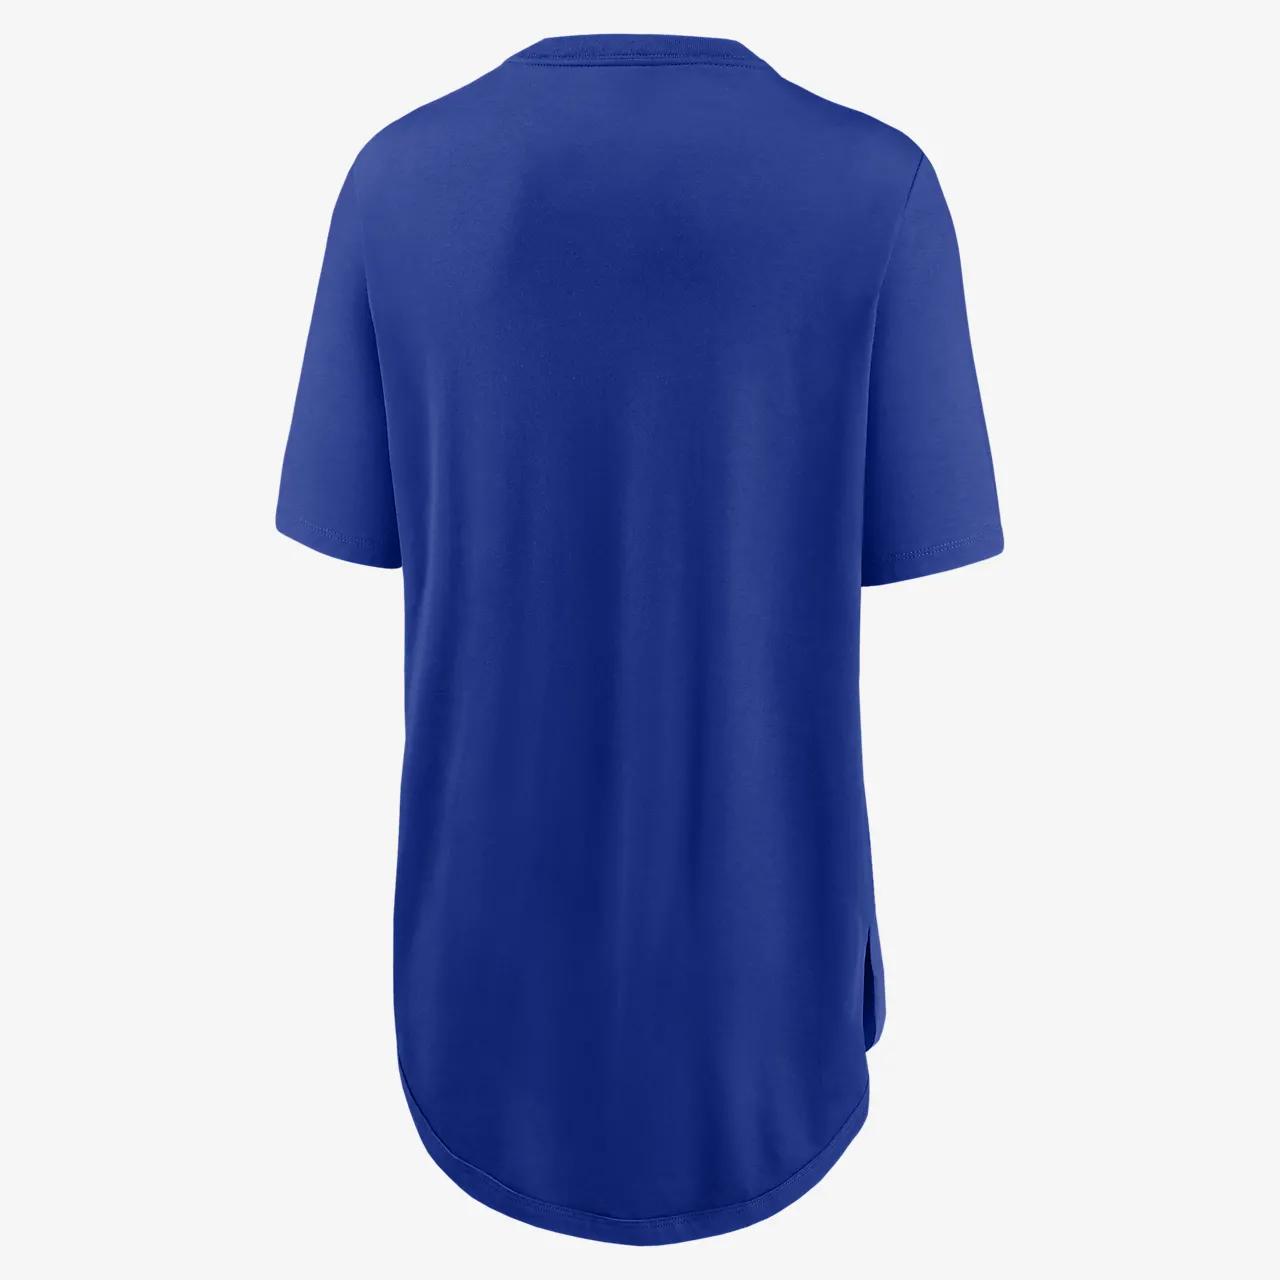 Nike Historic (NFL Bills) Women's T-Shirt FA20NKDP4DA-BB2